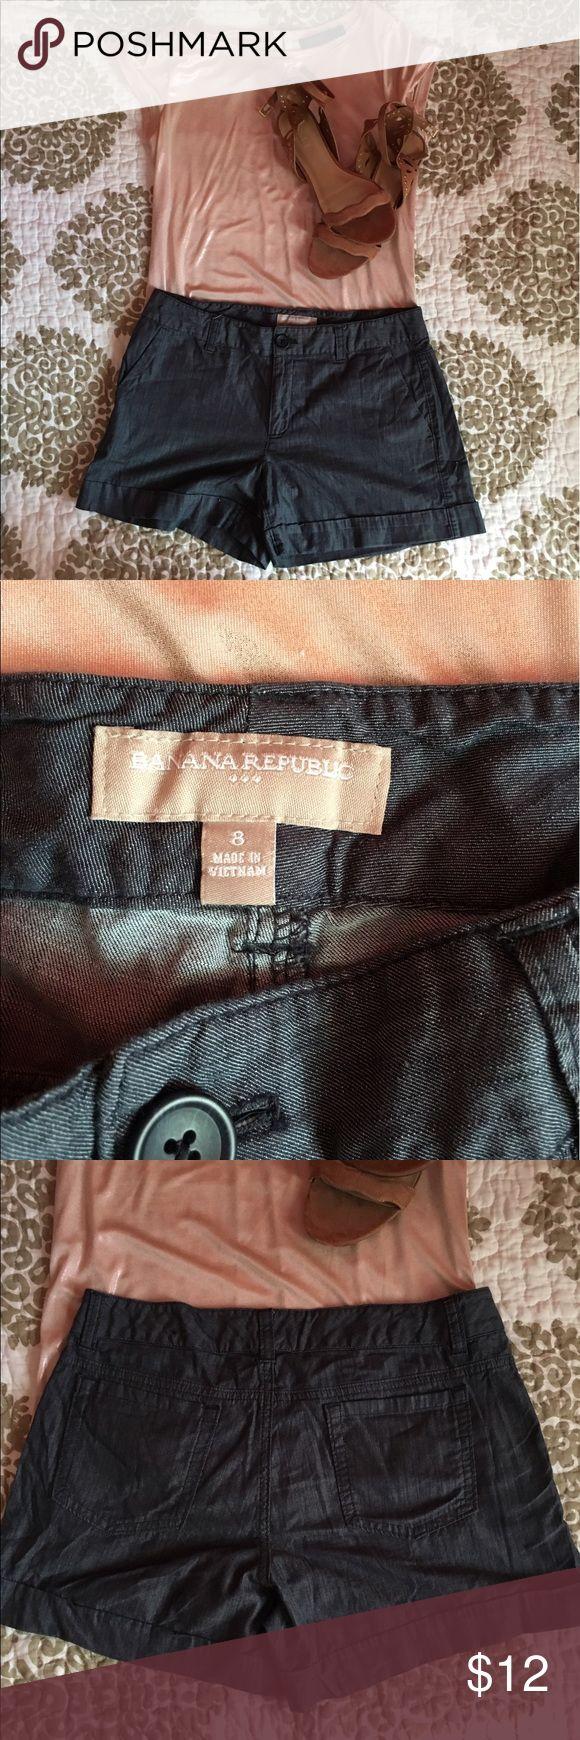 Banana Republic denim-like shorts These are a soft denim colored material! Banana Republic size 8, worn less than 5 times! Banana Republic Shorts